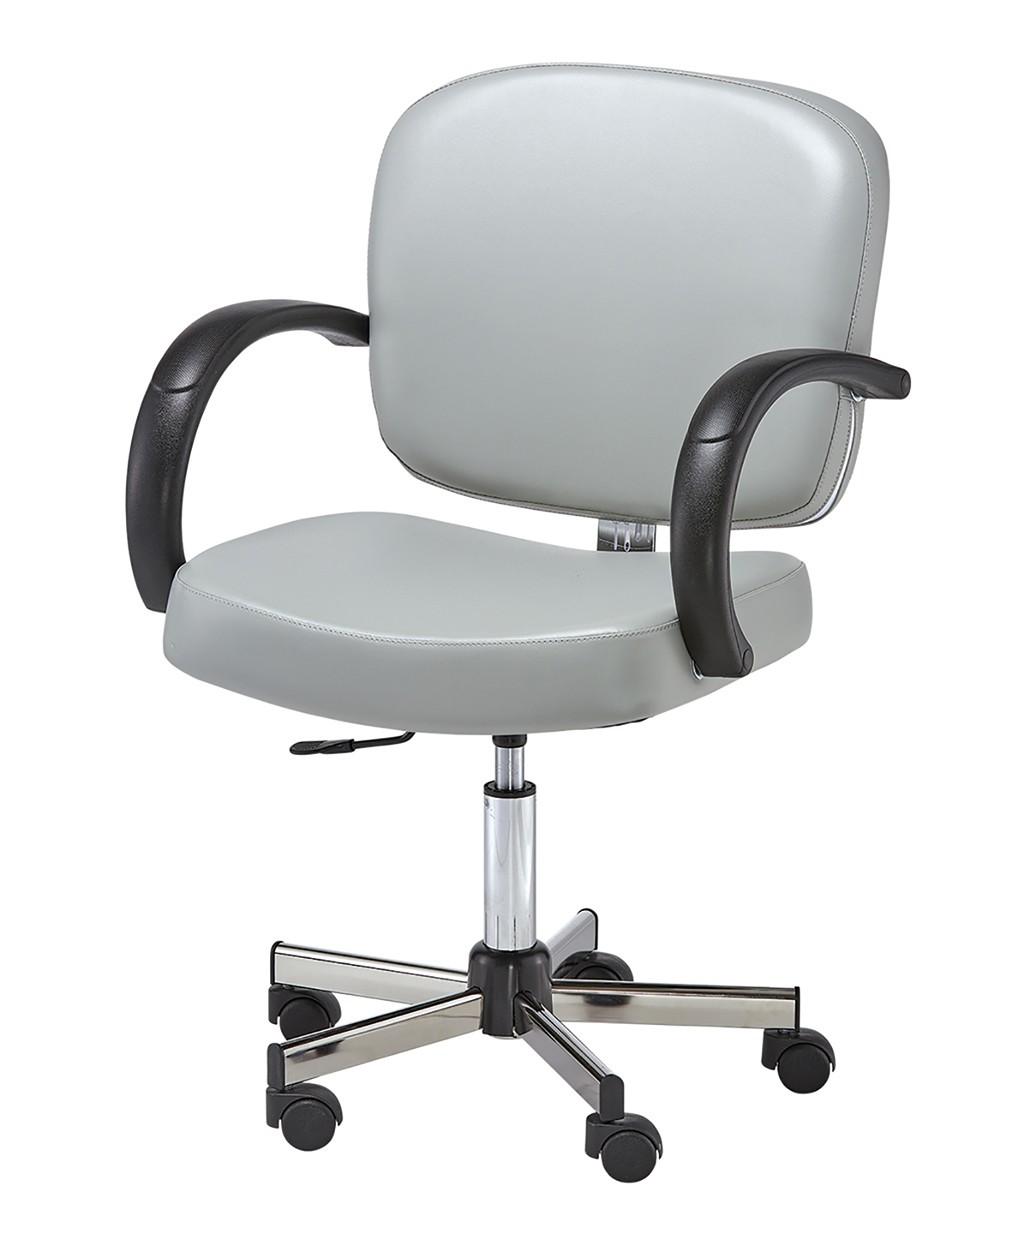 Pibbs 3692 Messina Desk Chair